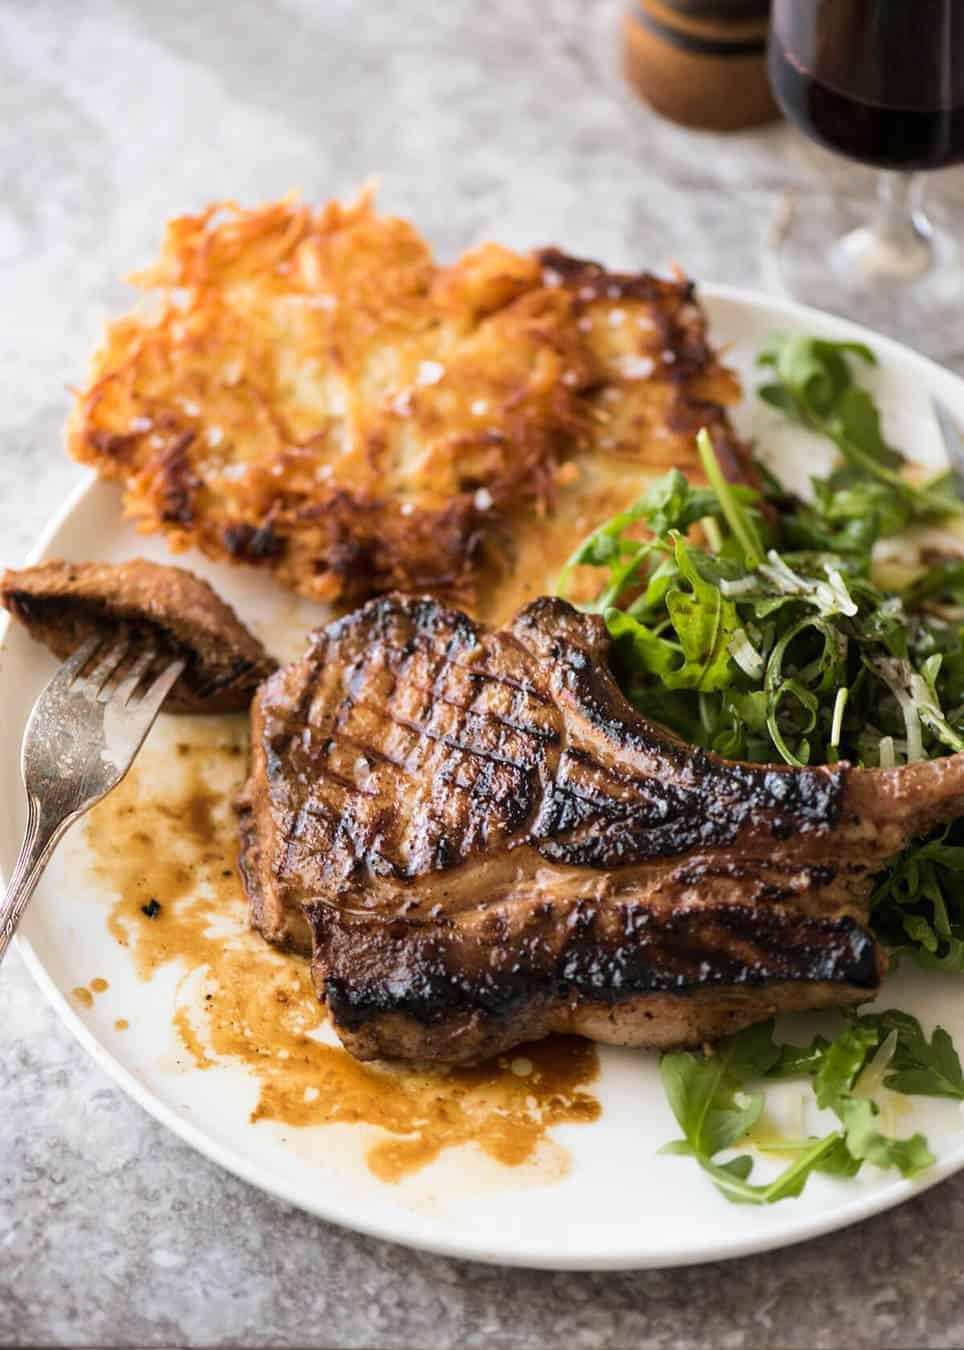 Marinate Pork Chops  A Great Marinade for Pork Chops